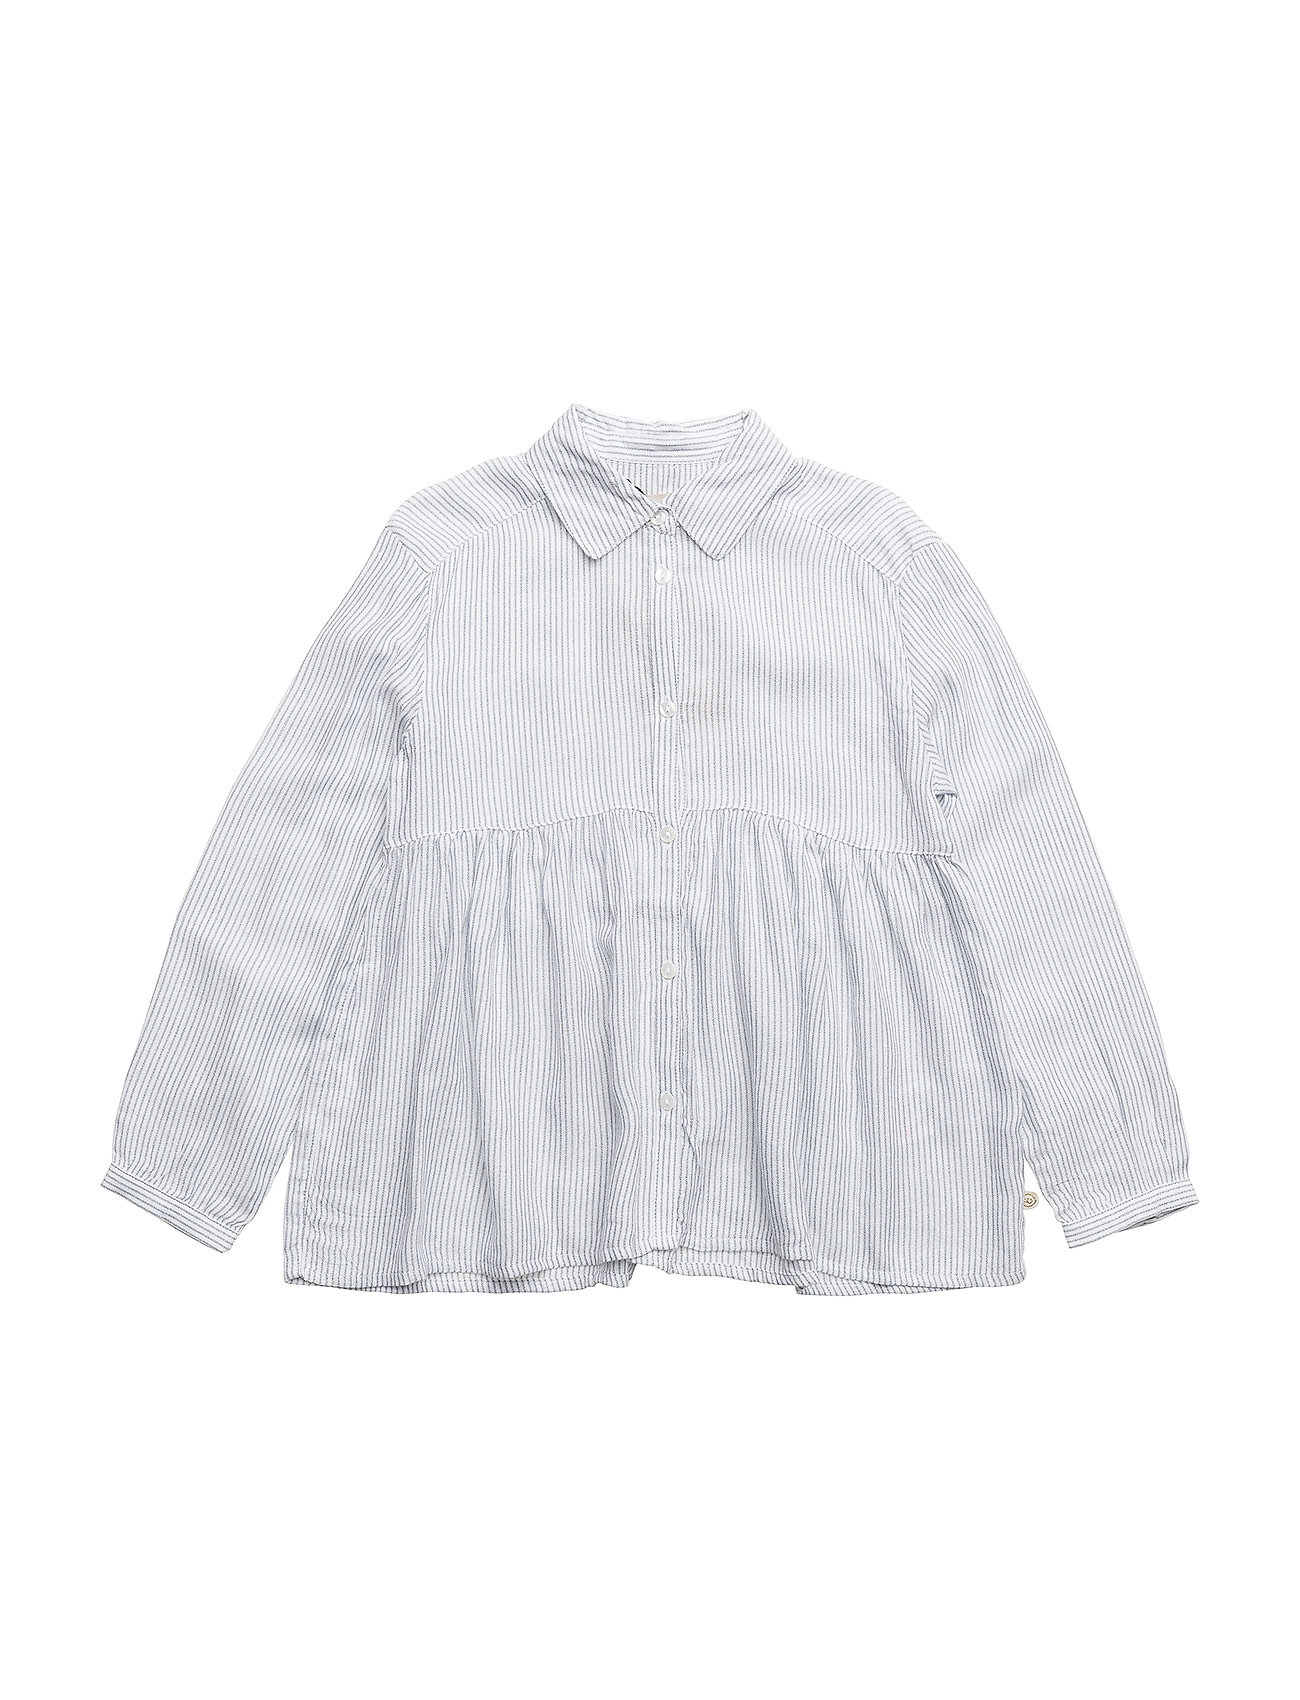 Minymo Shirt LS w. Y/D stripes - BLUE MIRAGE